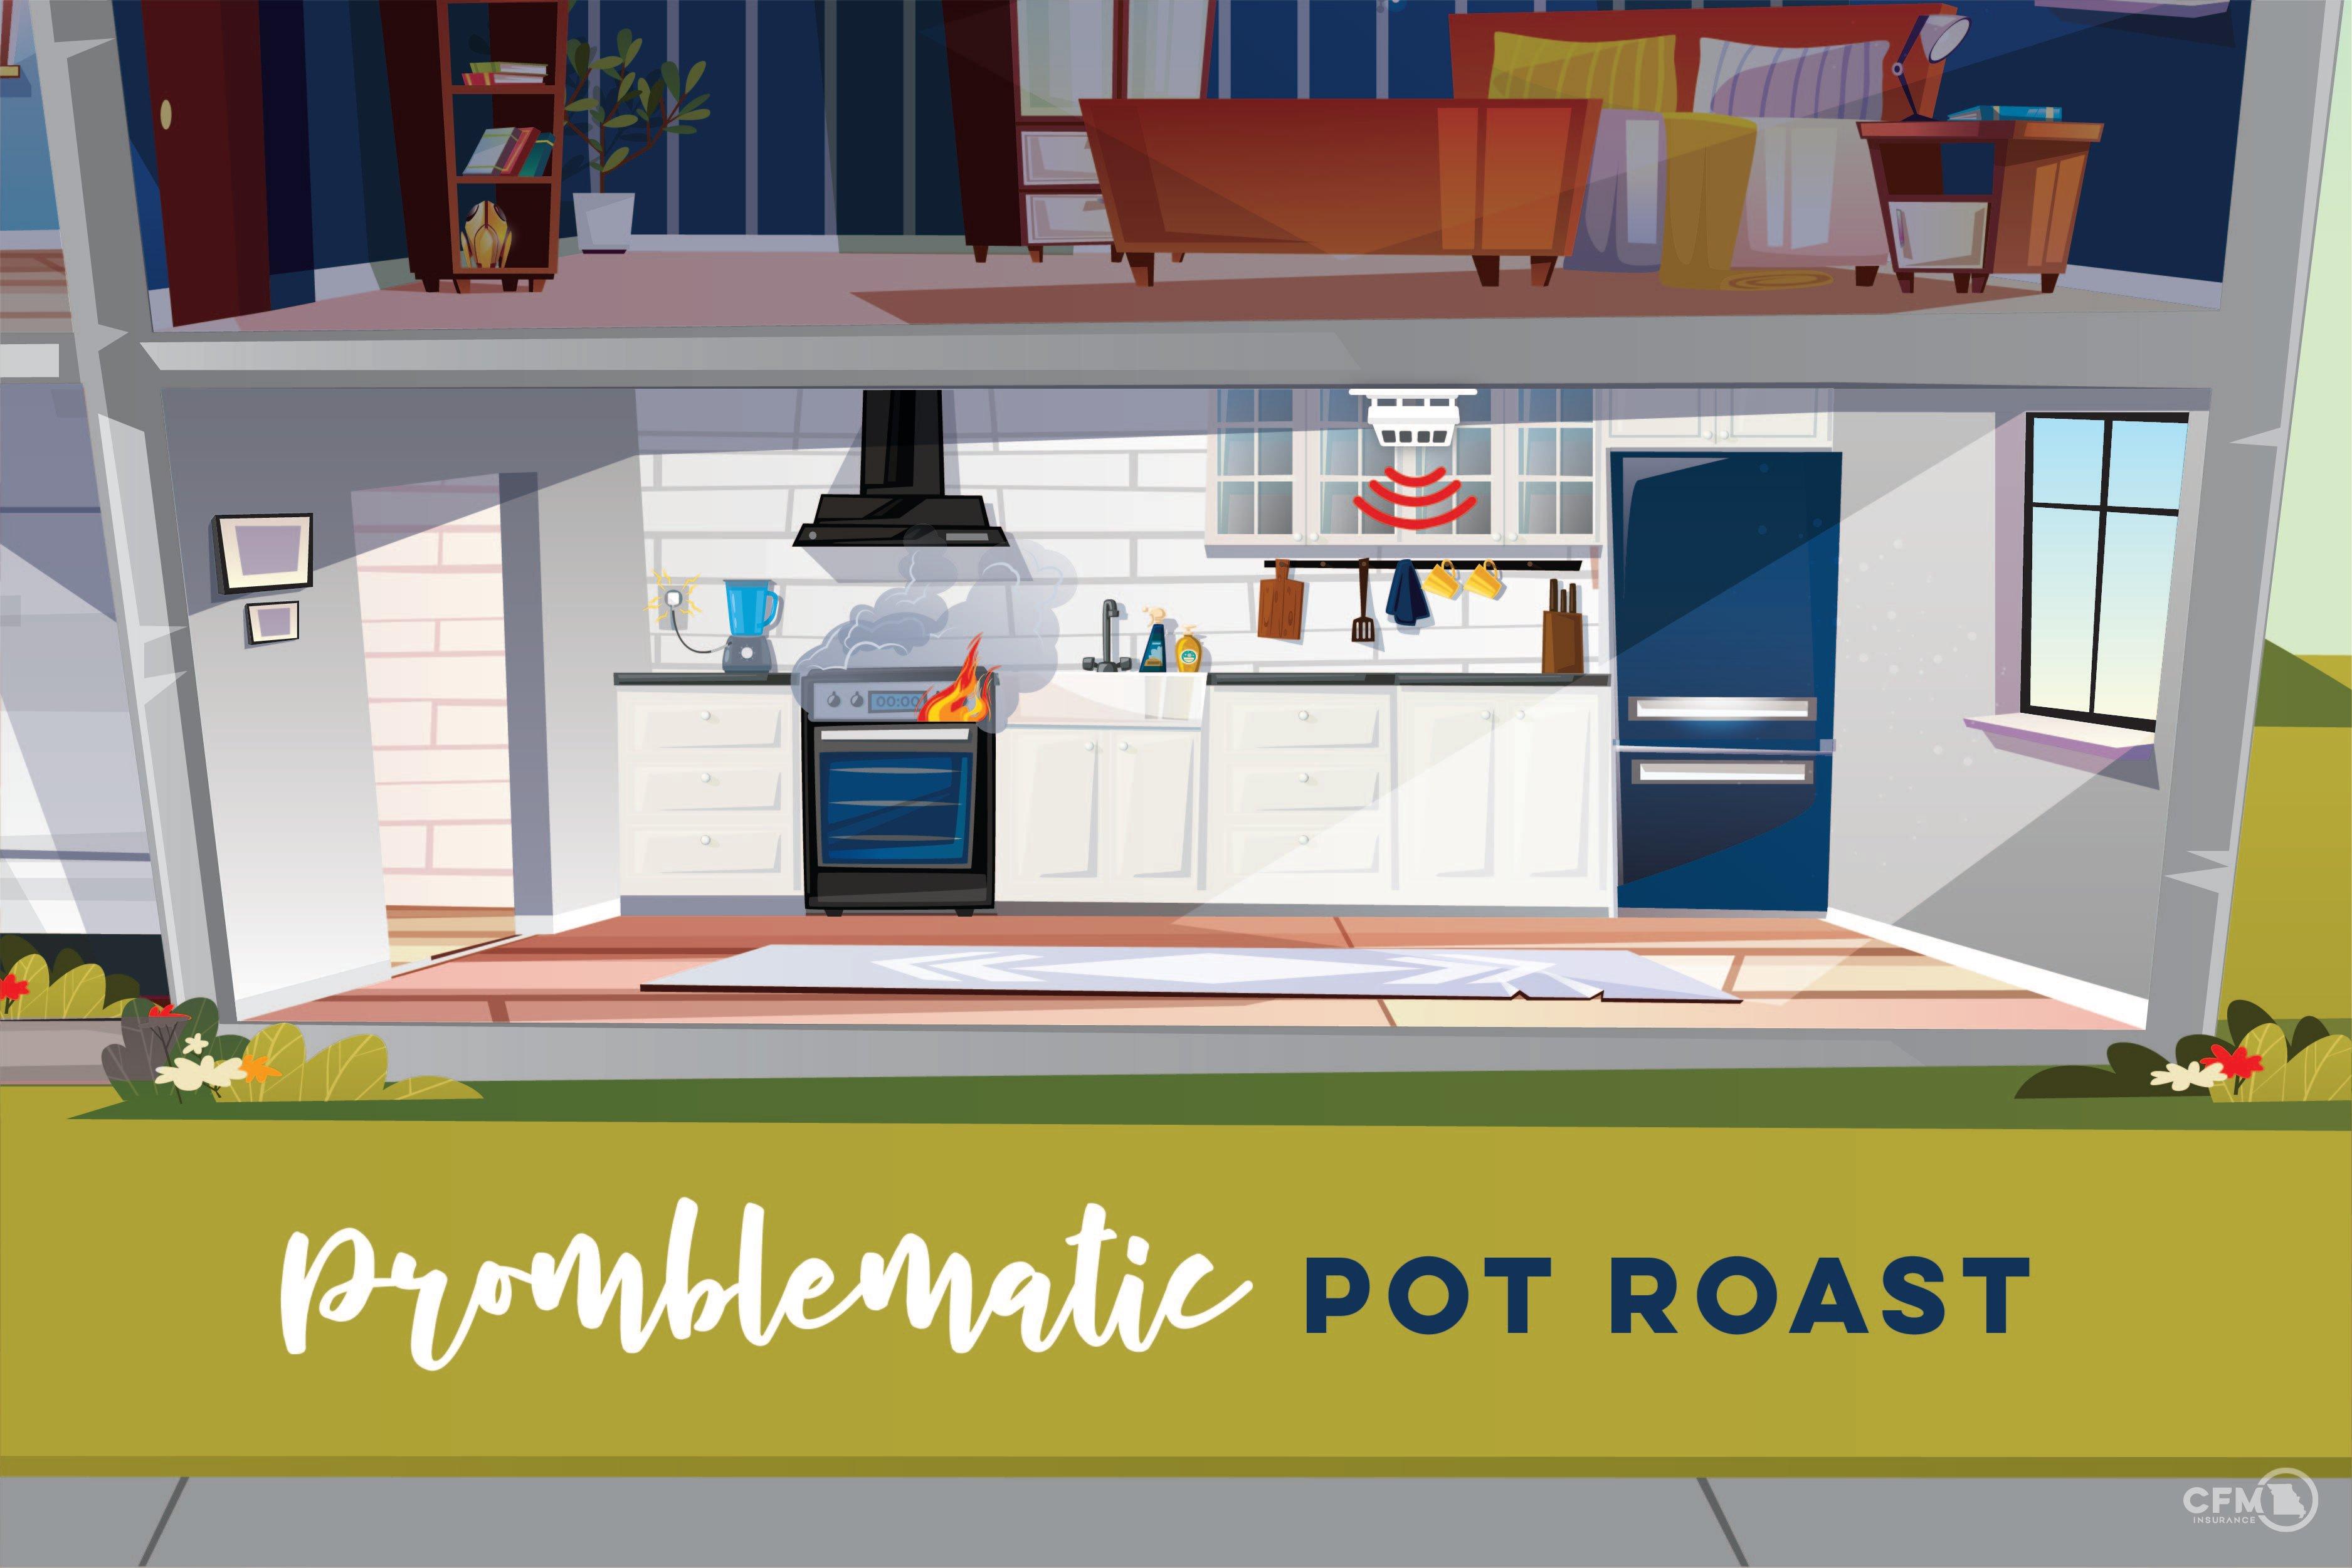 2. Problematic Pot Roast_Blog_Title-01